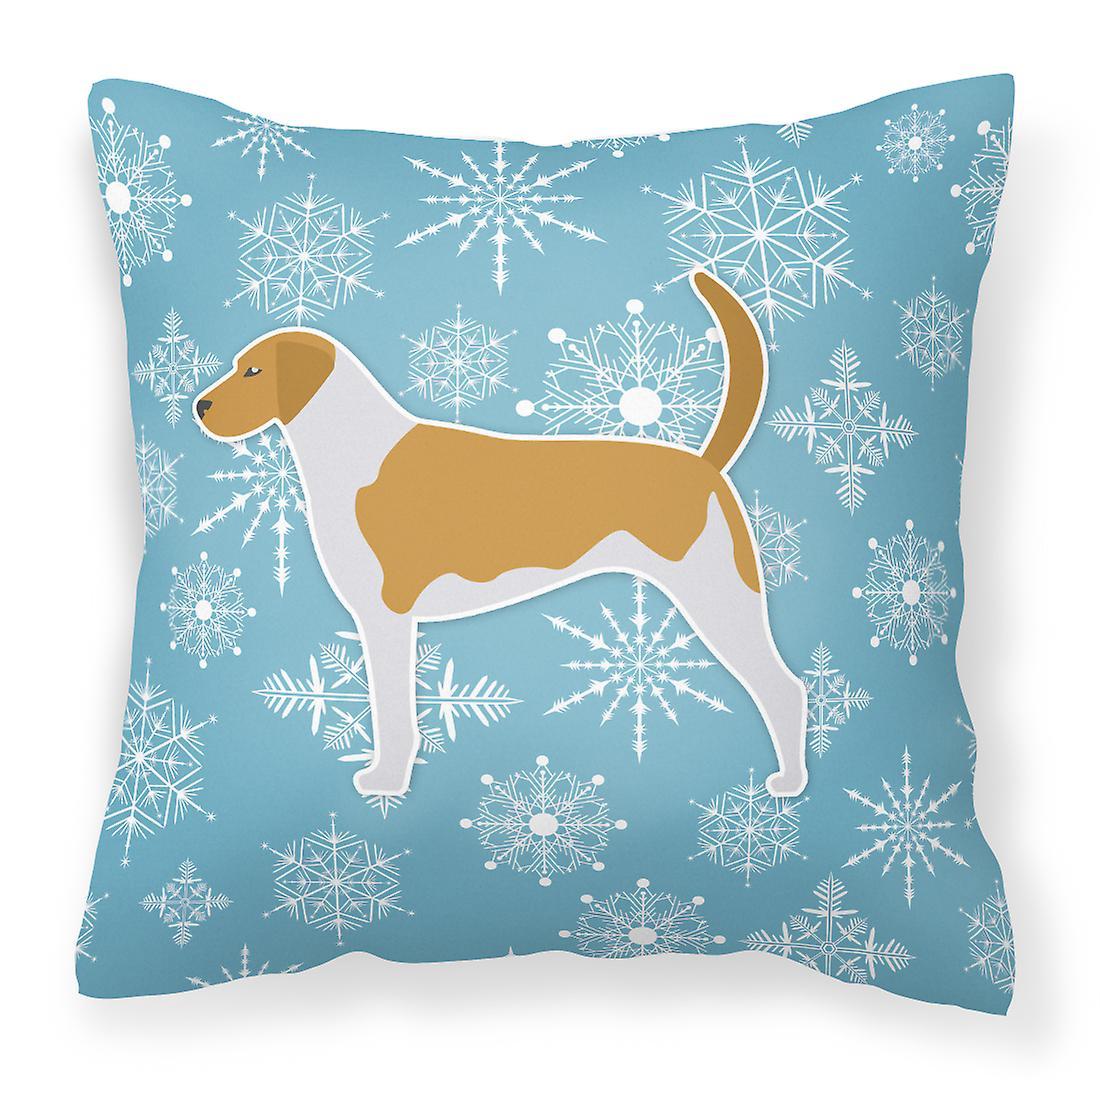 Décoratif Flocon Hiver American Tissu Neige Oreiller De Foxhound 534RLAj